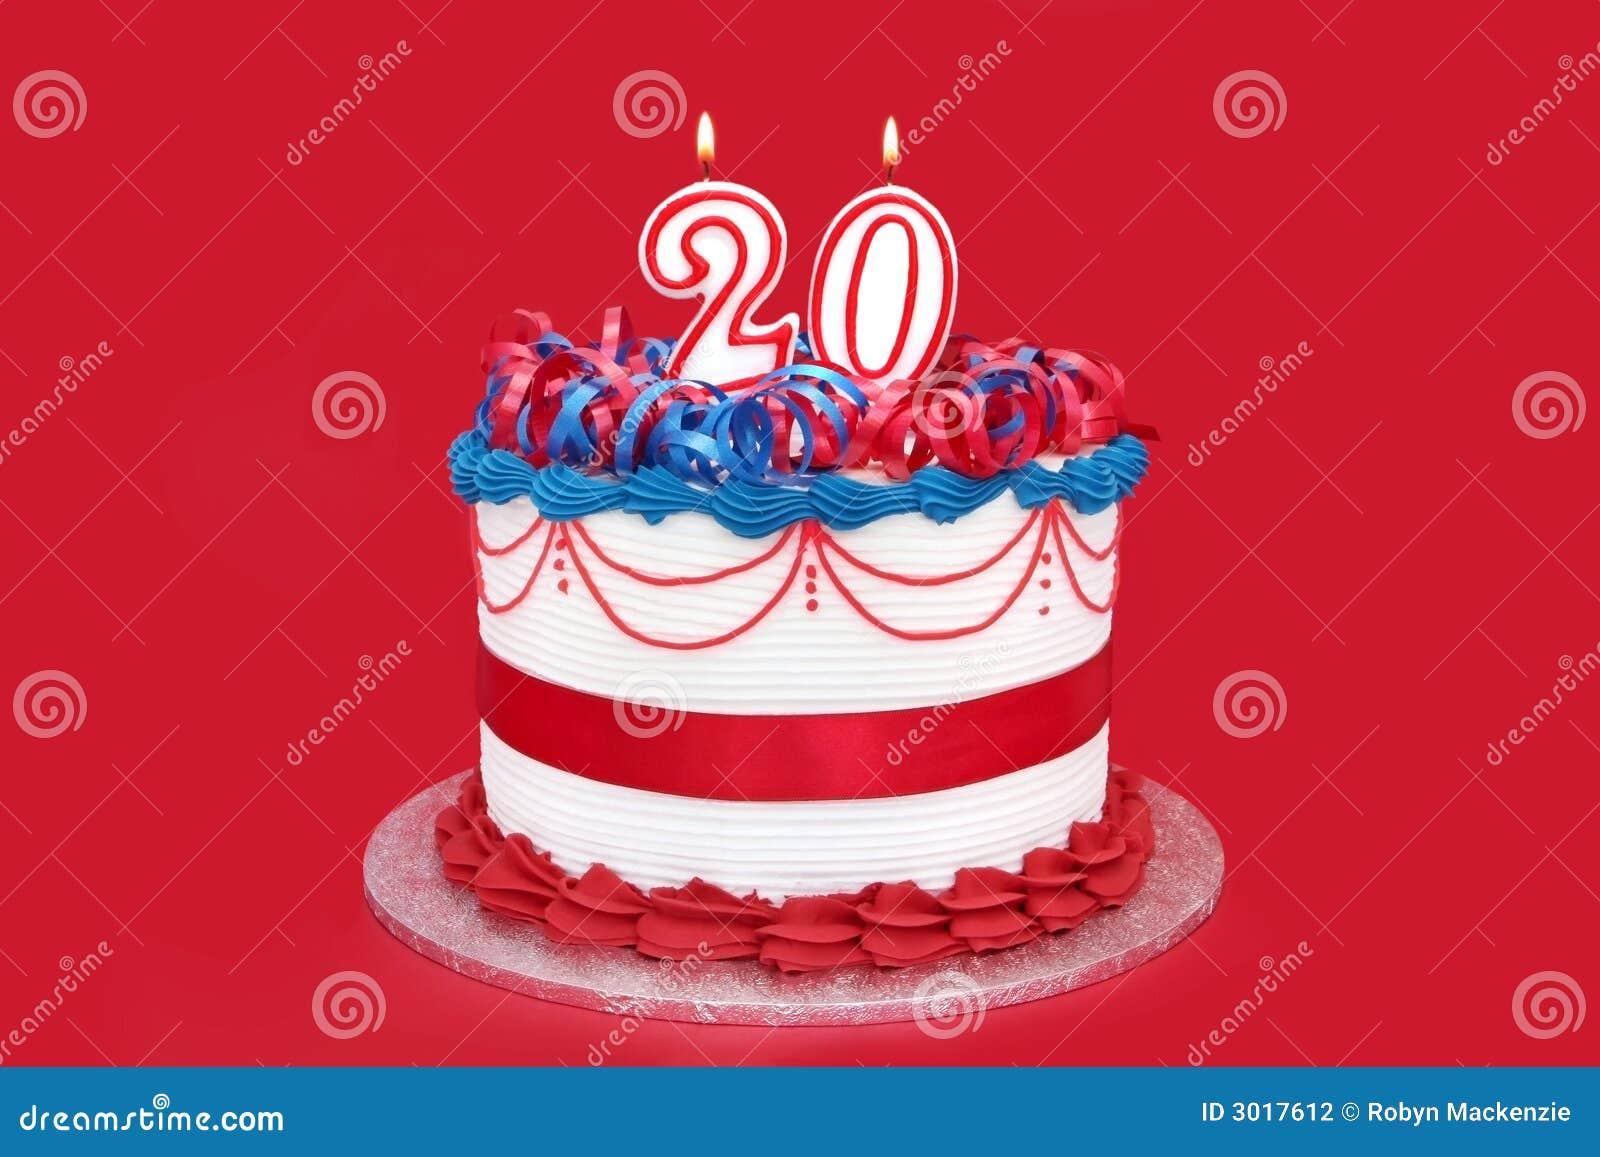 20th Cake